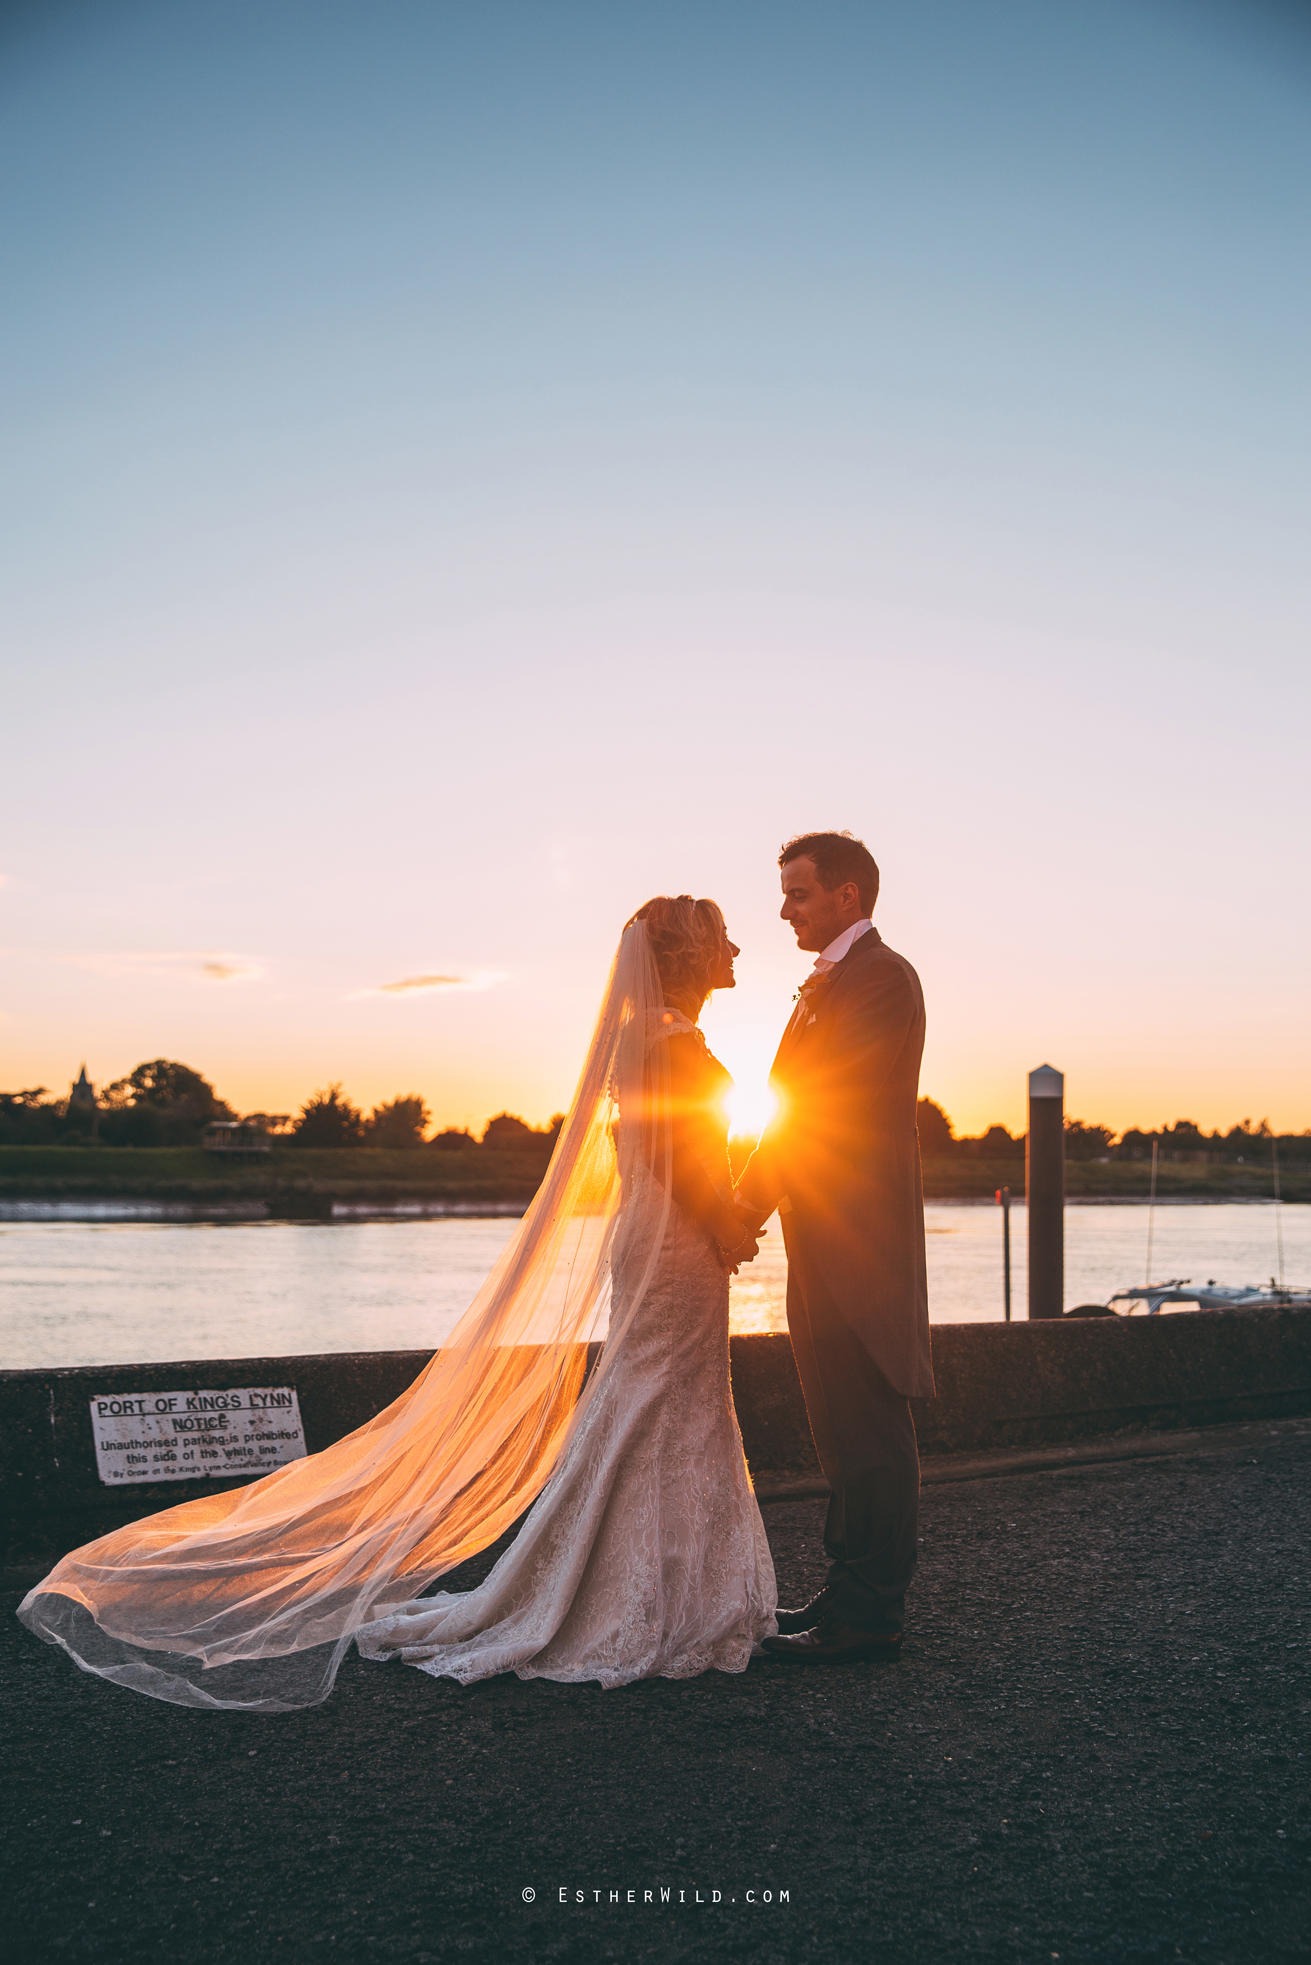 0817_Rathskellar_Kings_Lynn_East_Lexham_Church_Wedding_Photographer_Esther_Wild_IMG_2543.jpg